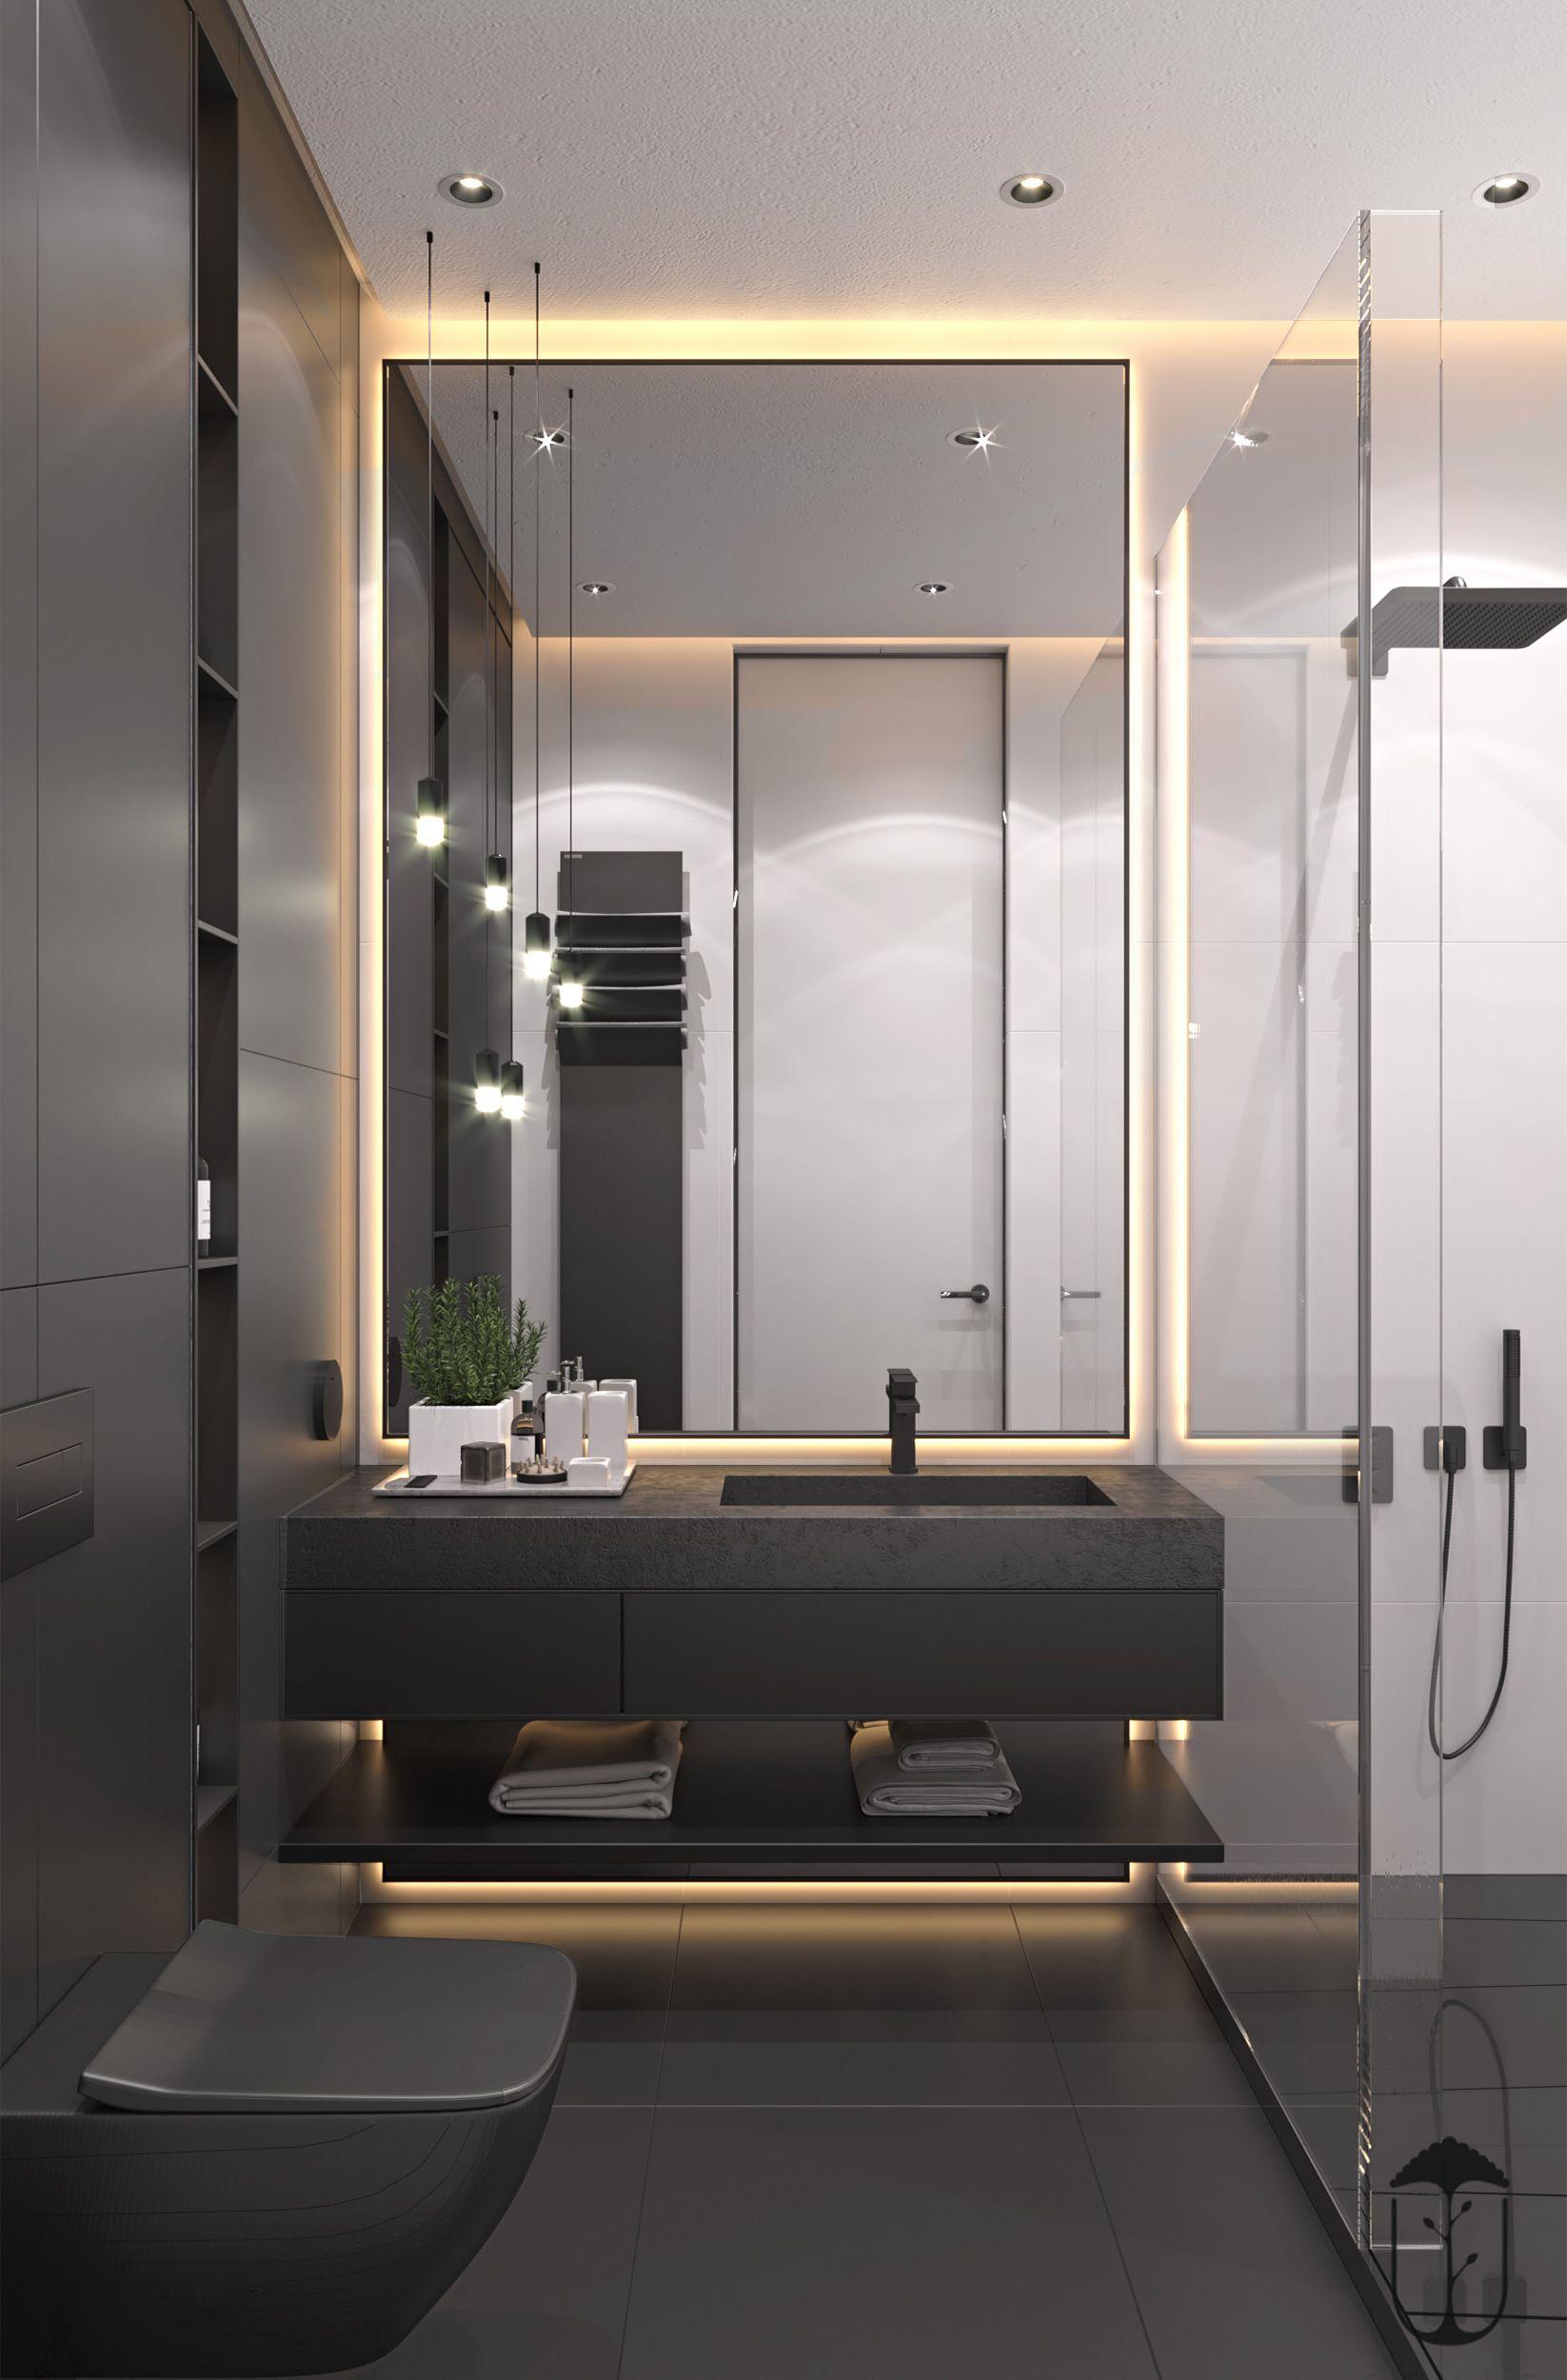 Pin By Liuyue On Ui025 Simple Bathroom Bathroom Design Luxury Modern Bathroom Simple interior bathroom design